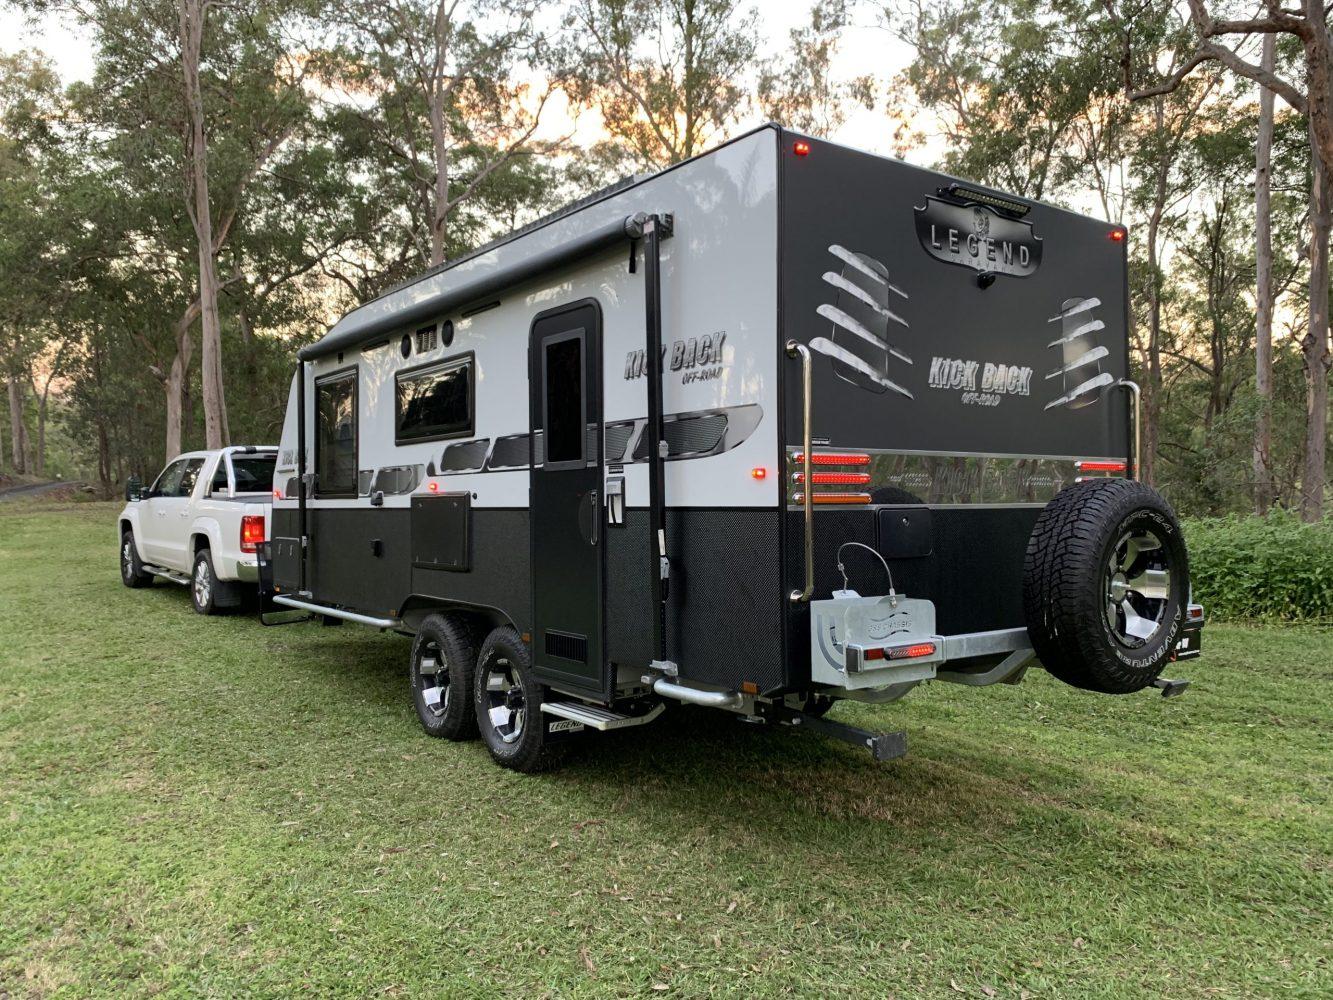 Legend Kickback Offroad Family Bunk Van